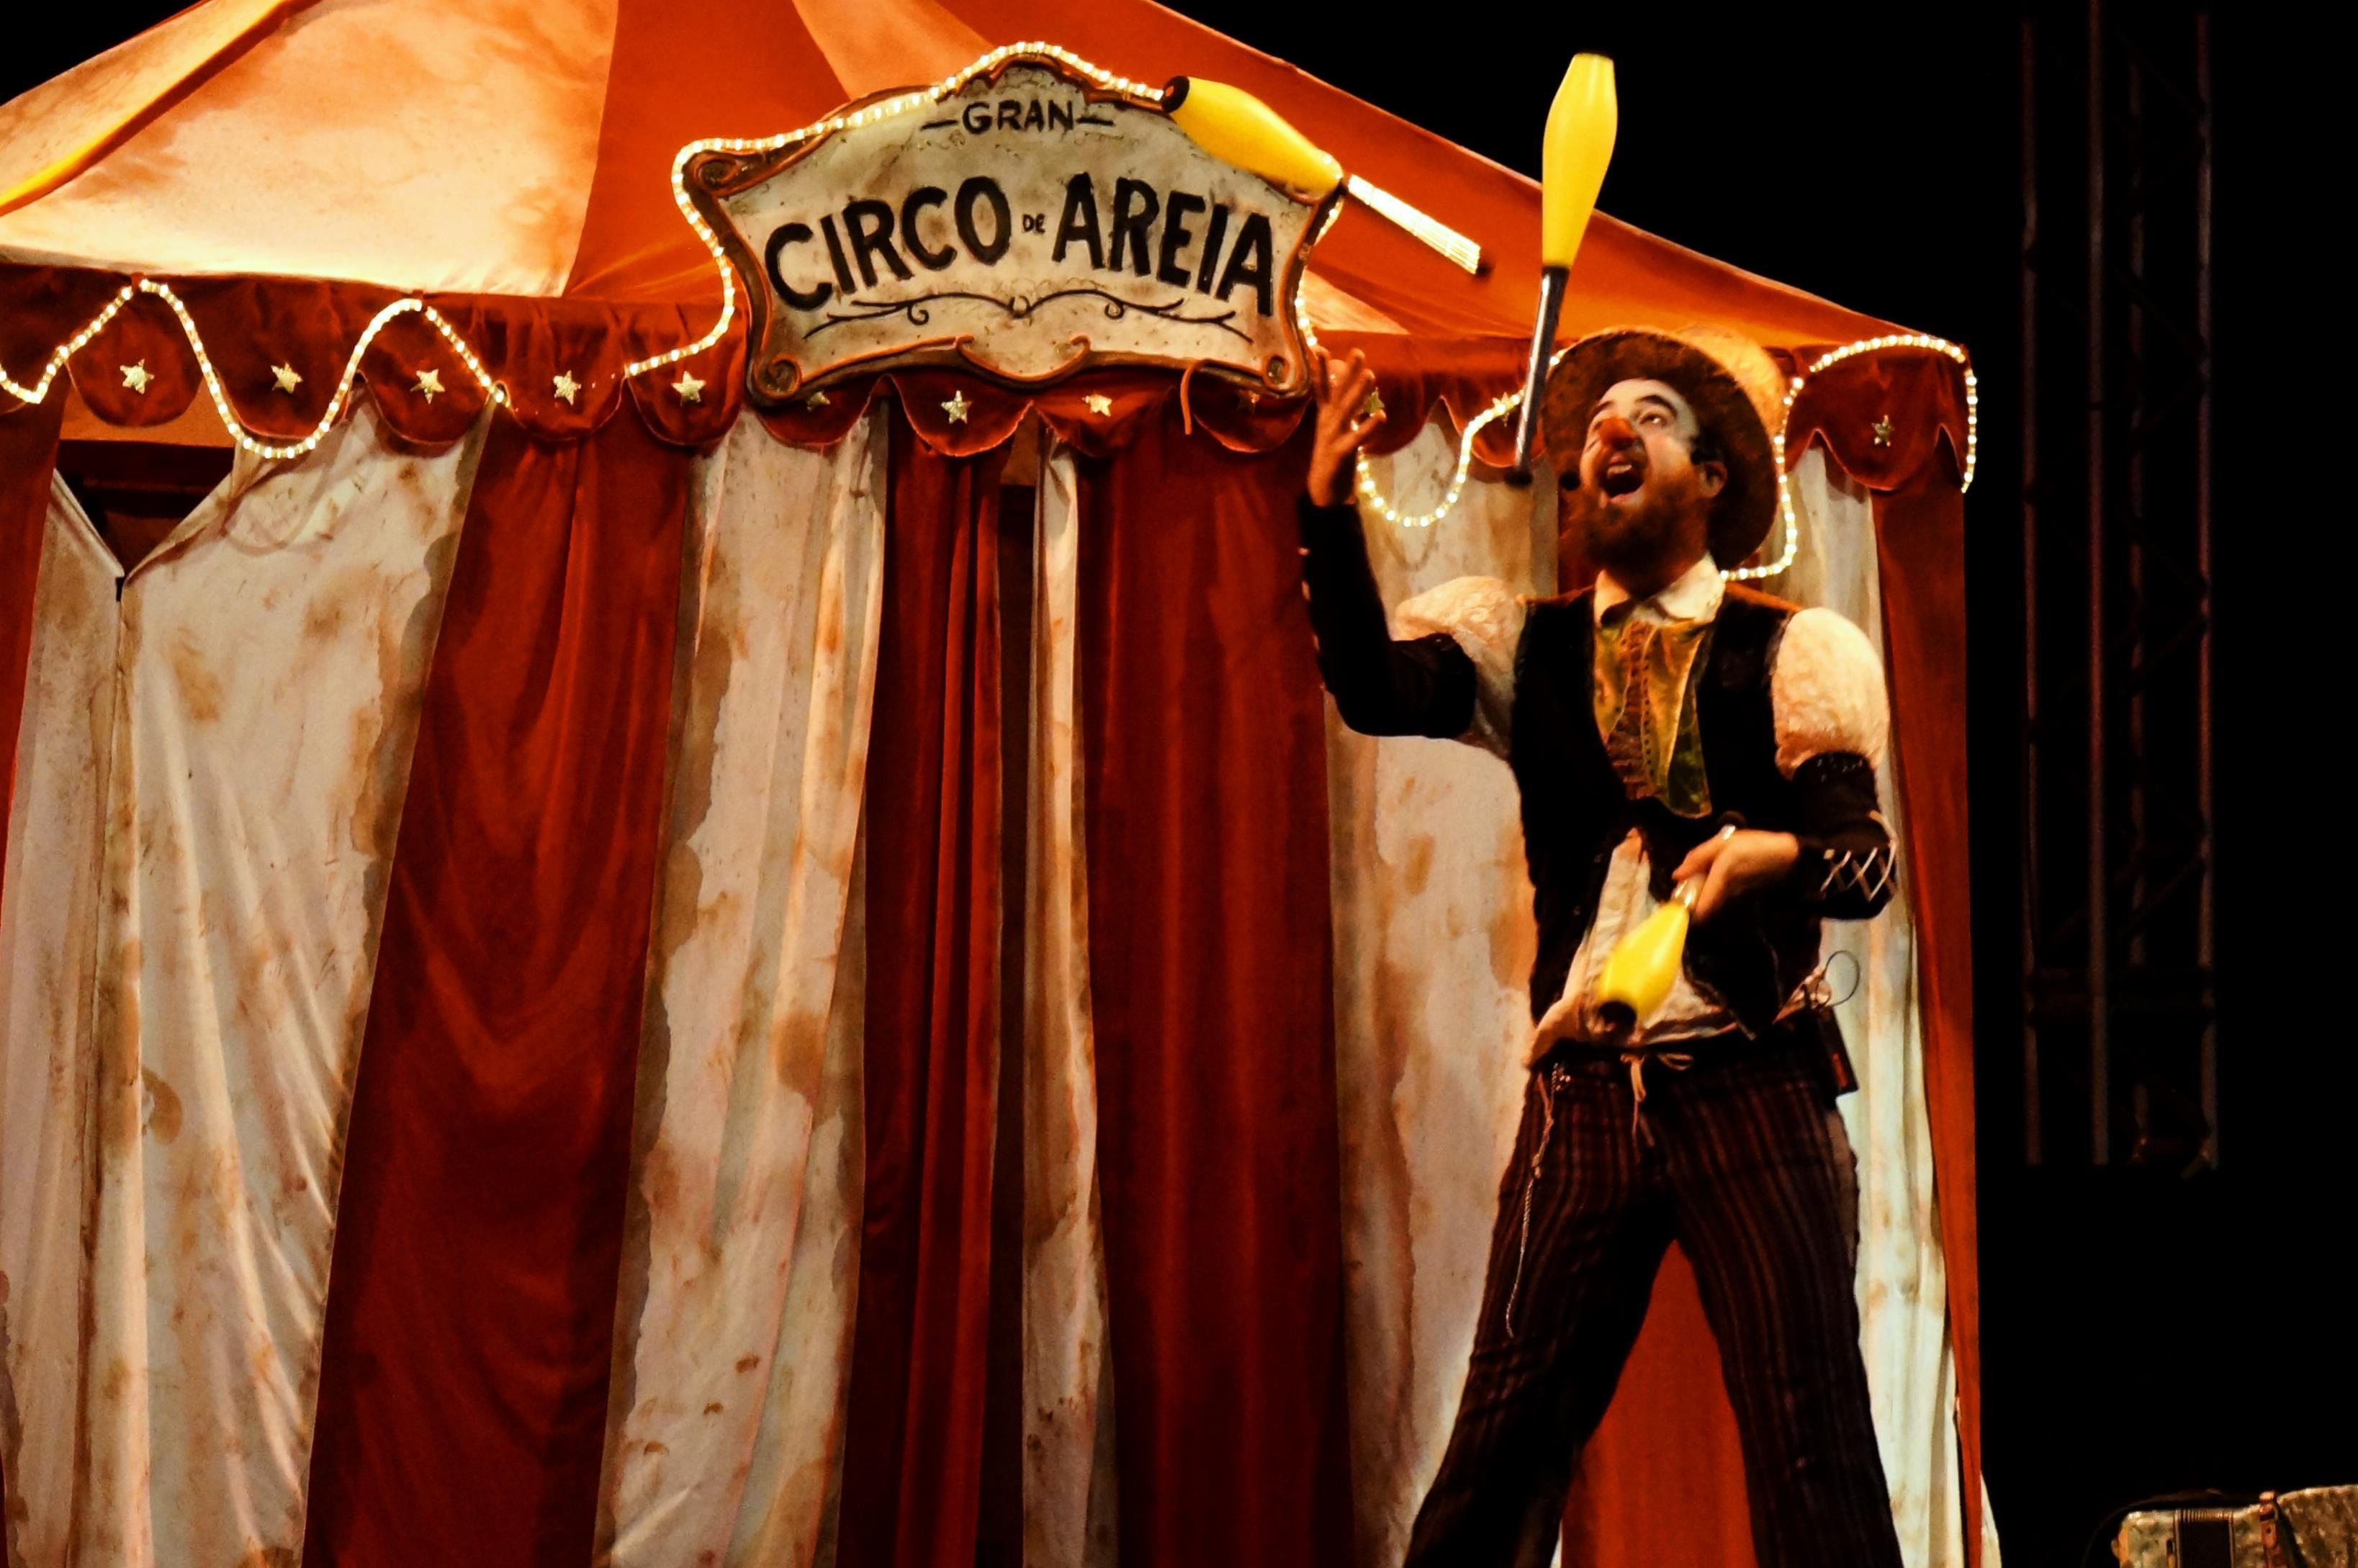 Gran Circo 03 - foto de Higaro Rosales